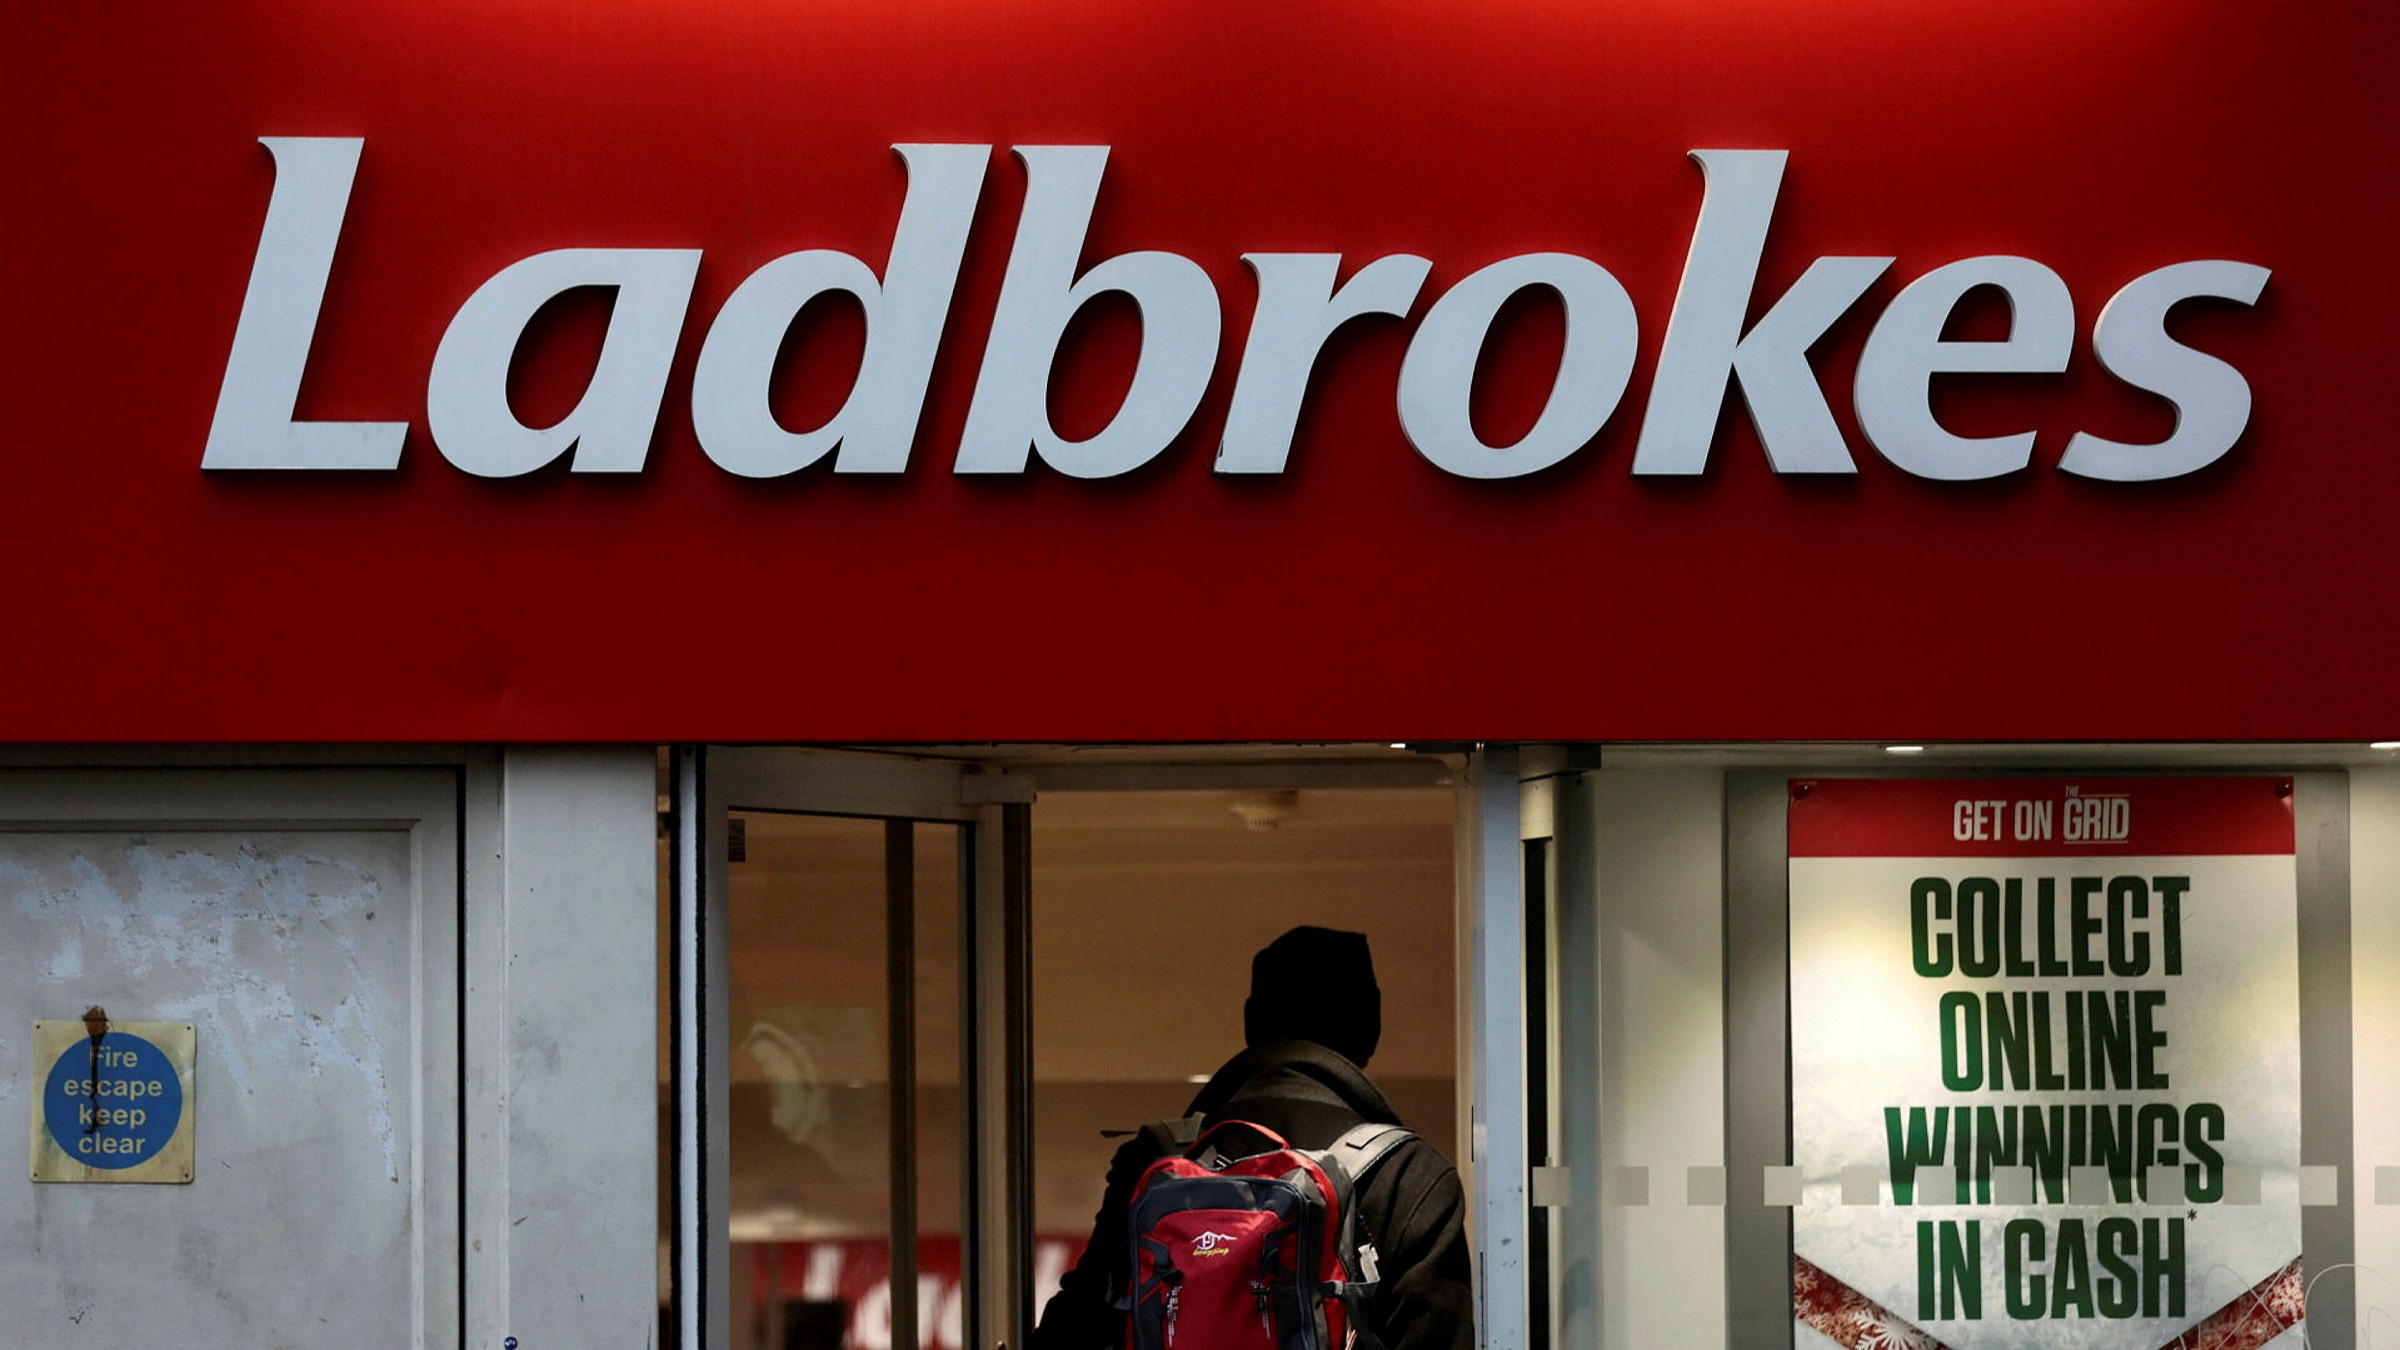 Online betting offers ladbrokes plc legel sports betting